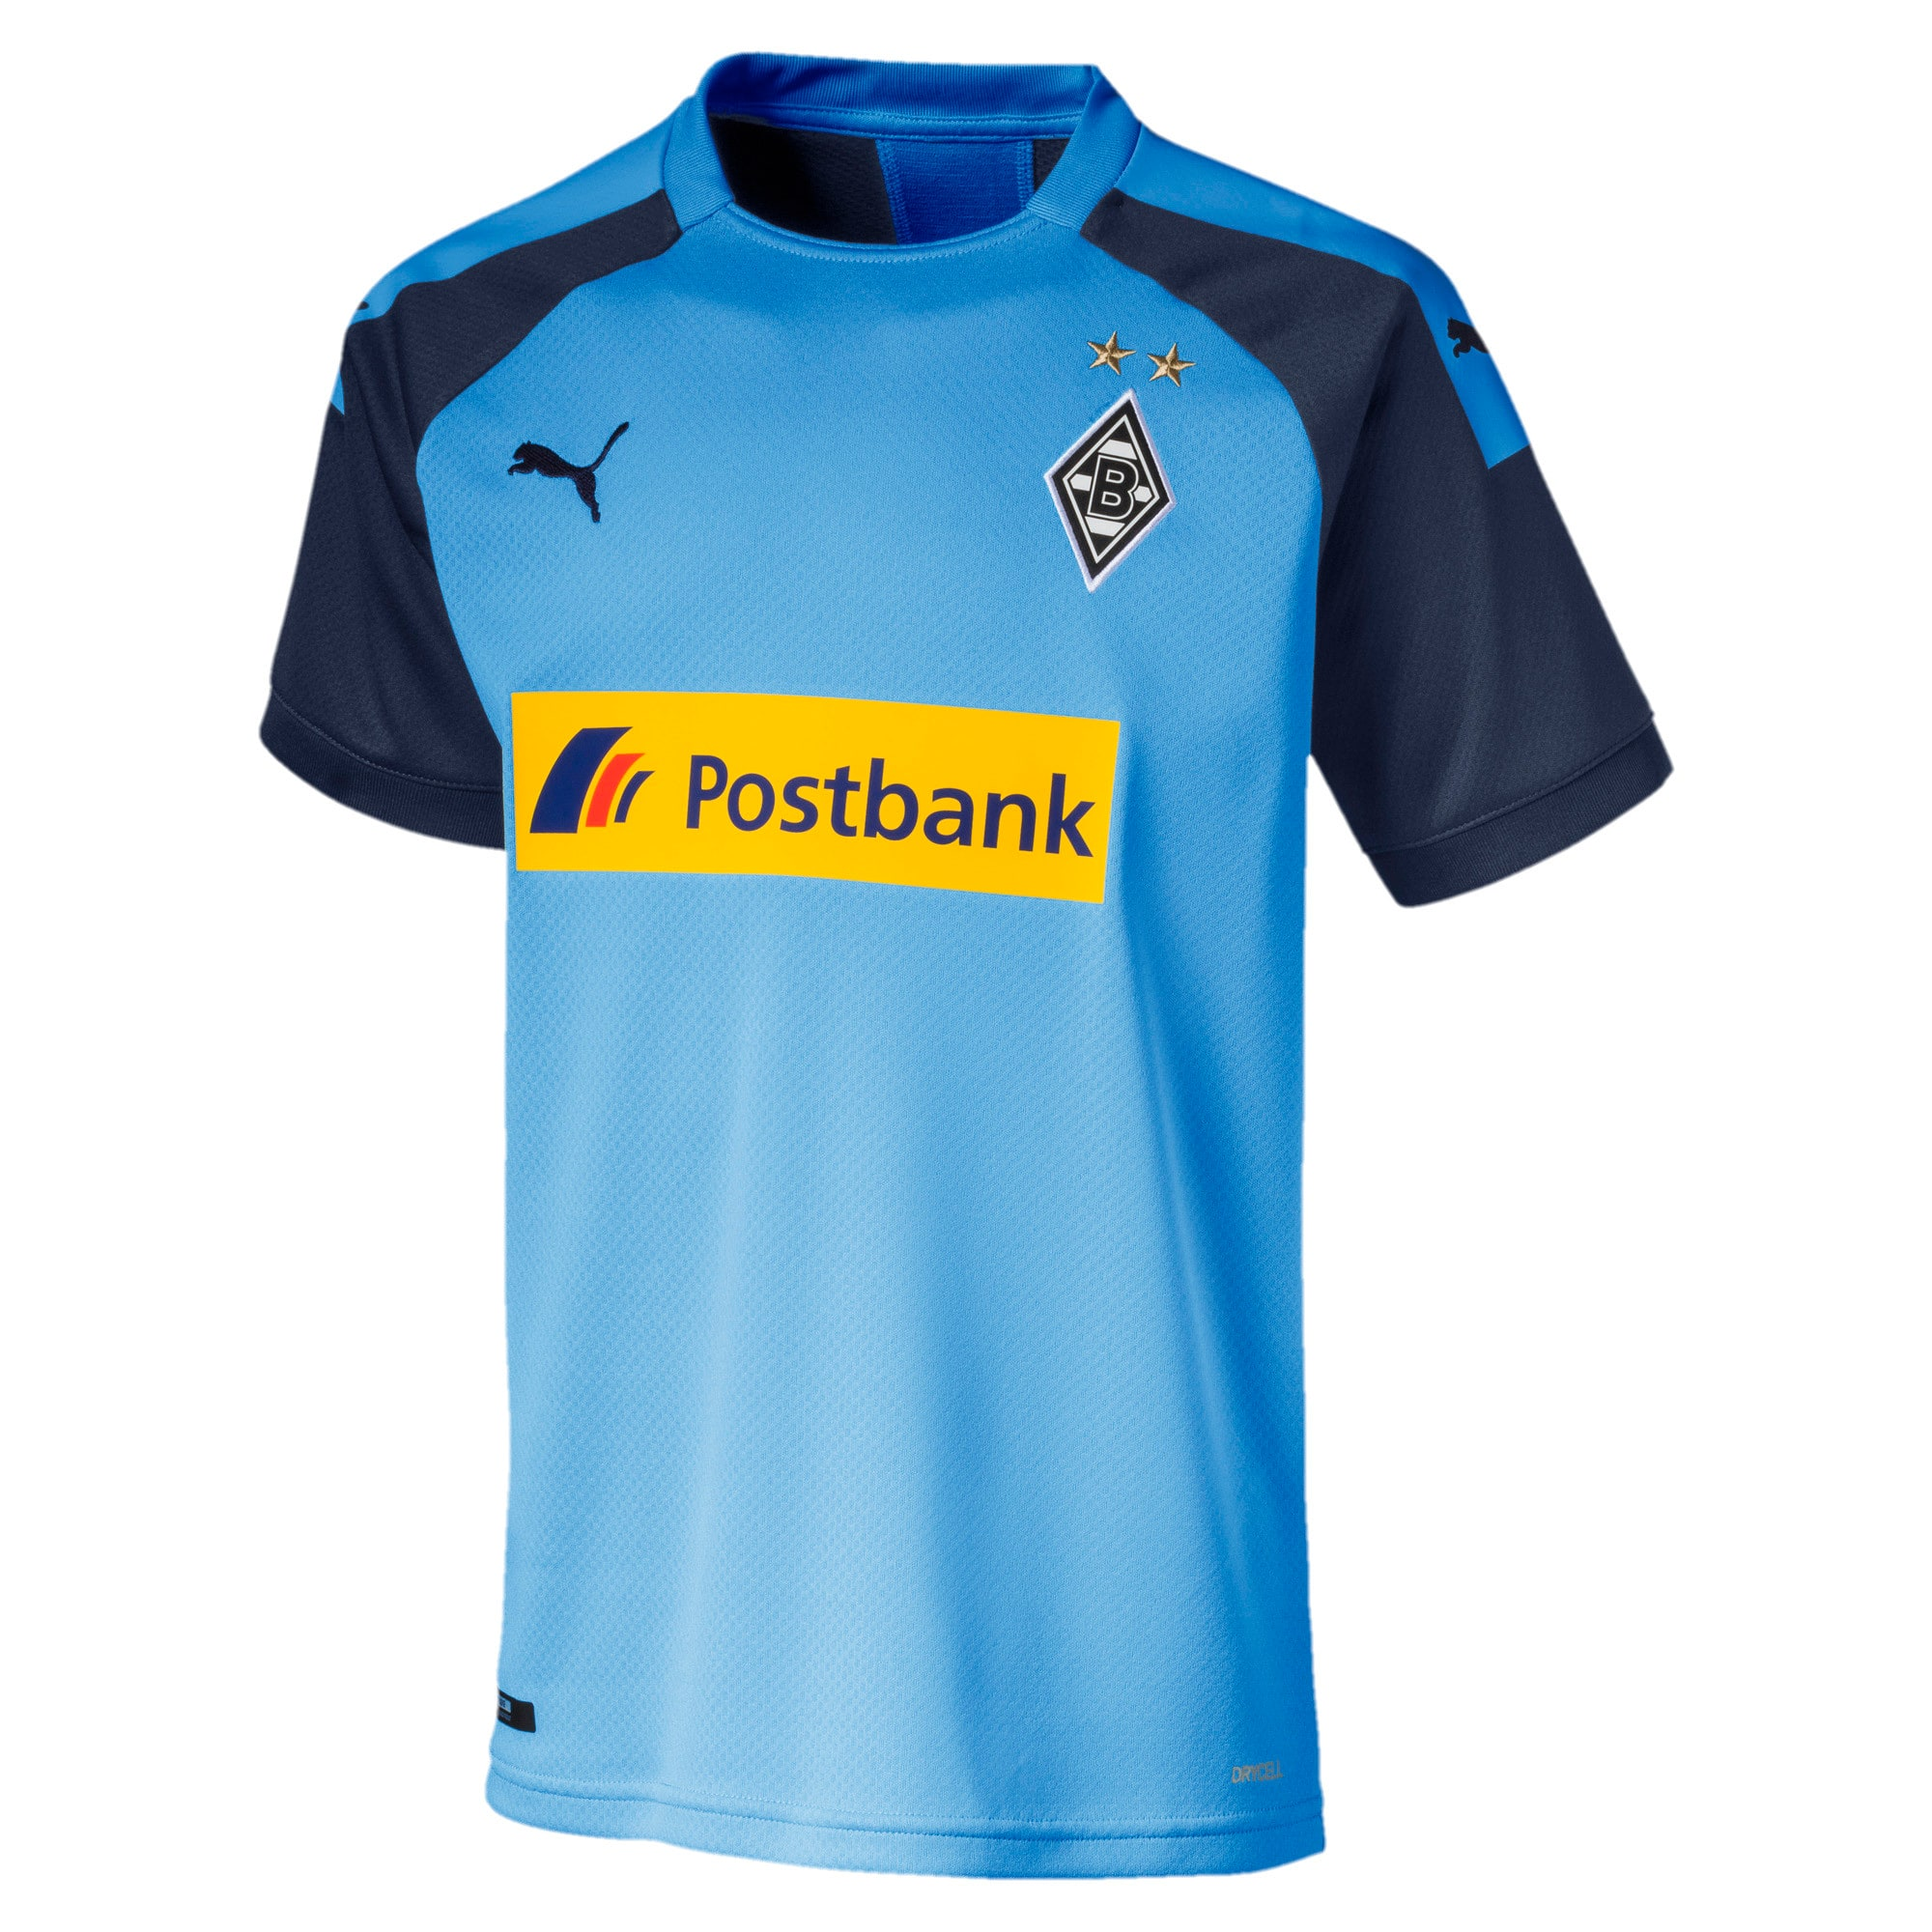 Thumbnail 1 of Borussia Mönchengladbach Boys' Away Replica Jersey, Team Light Blue-Peacoat, medium